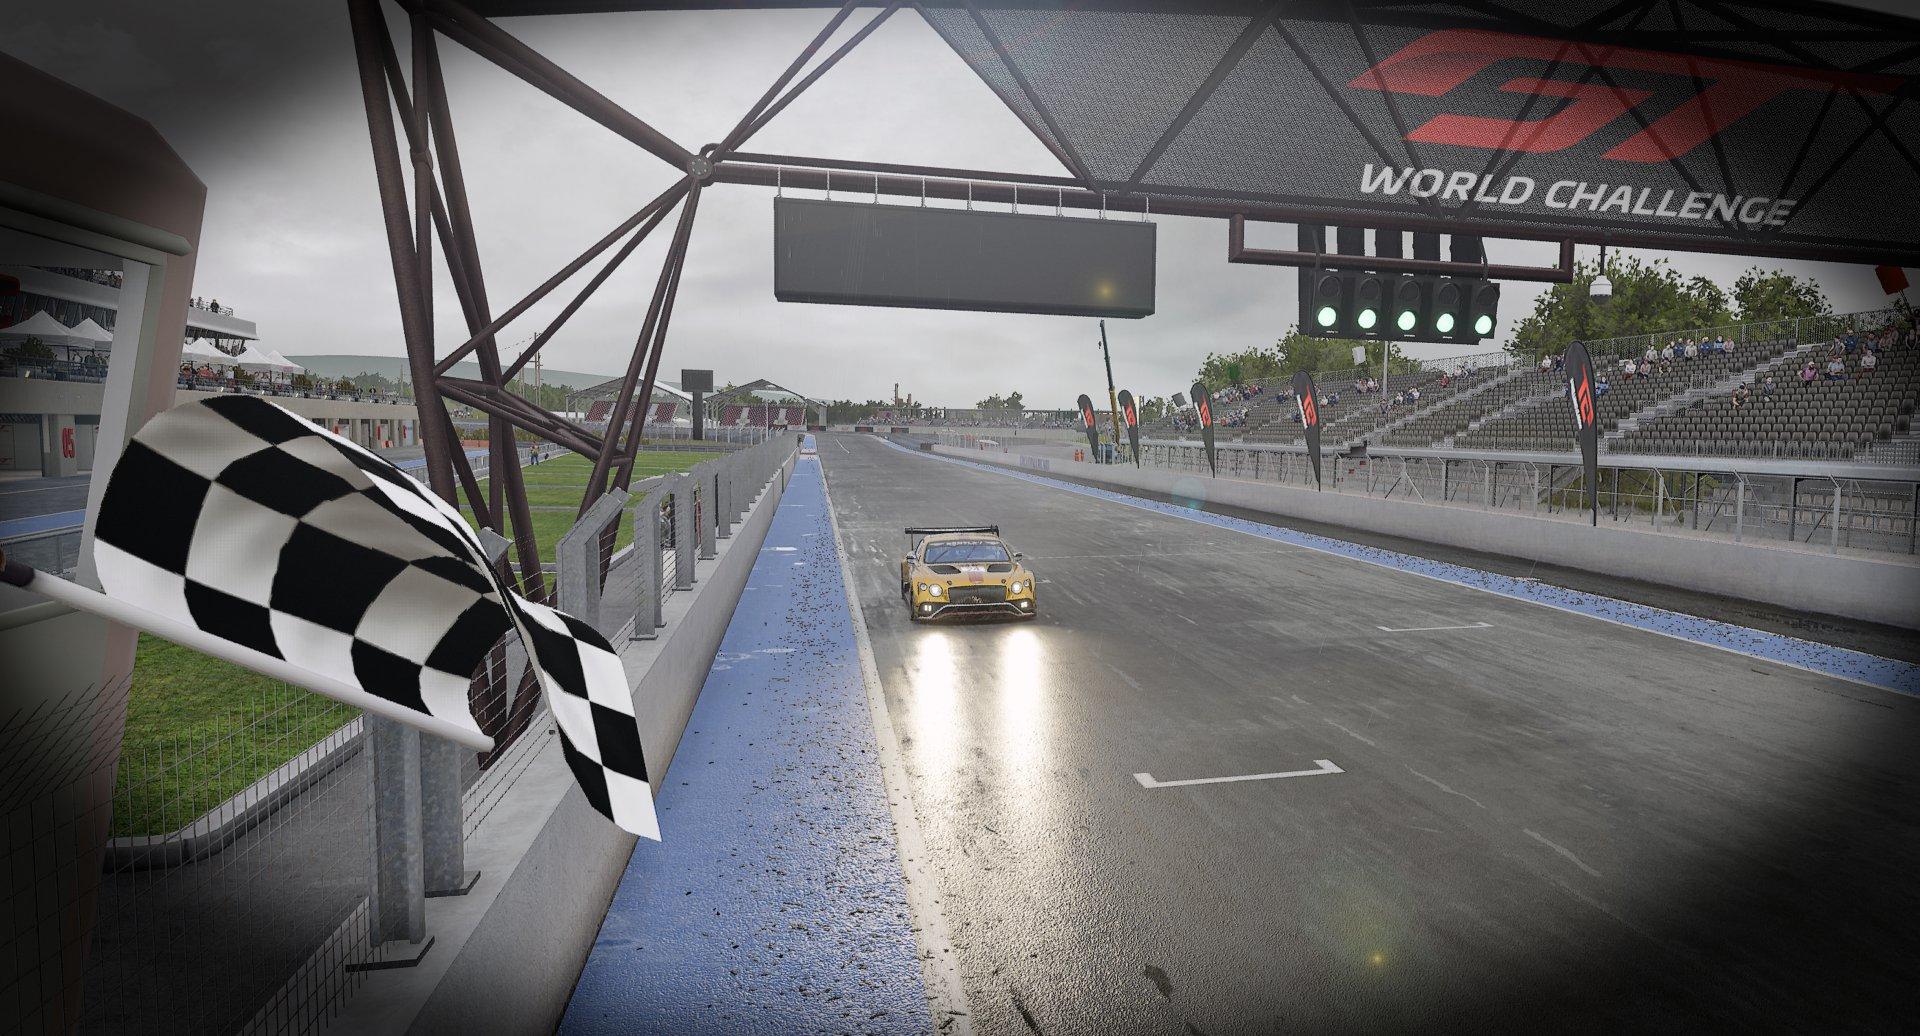 Assetto Corsa Competizione Screenshot 2021.05.17 - 11.35.28.03.jpg